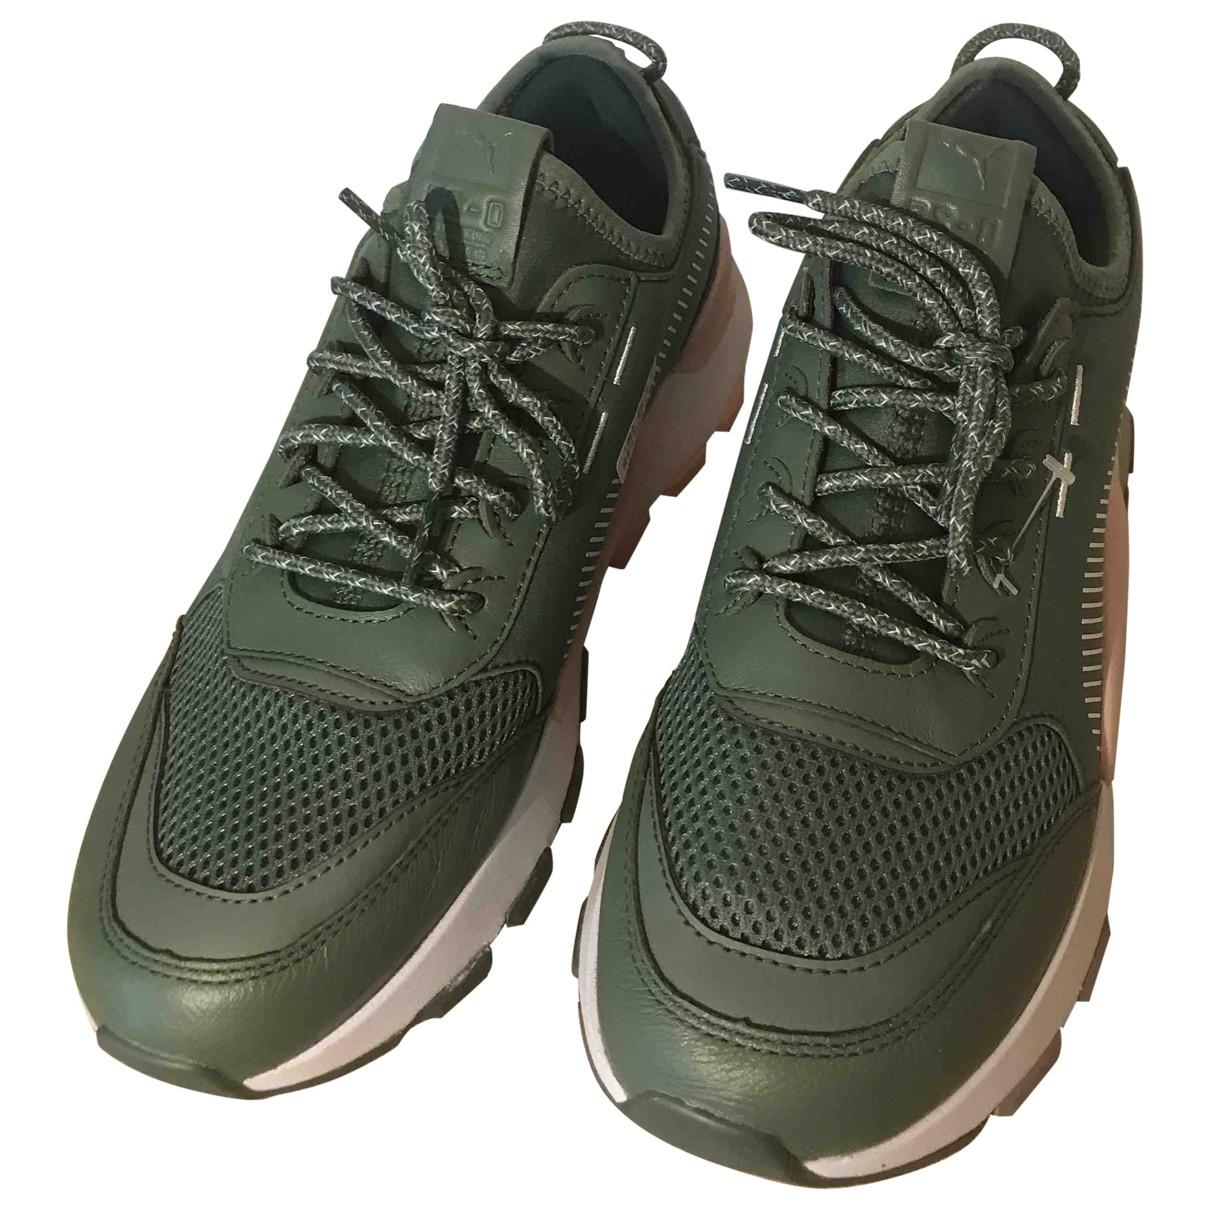 Puma \N Khaki Leather Trainers for Women 38.5 EU